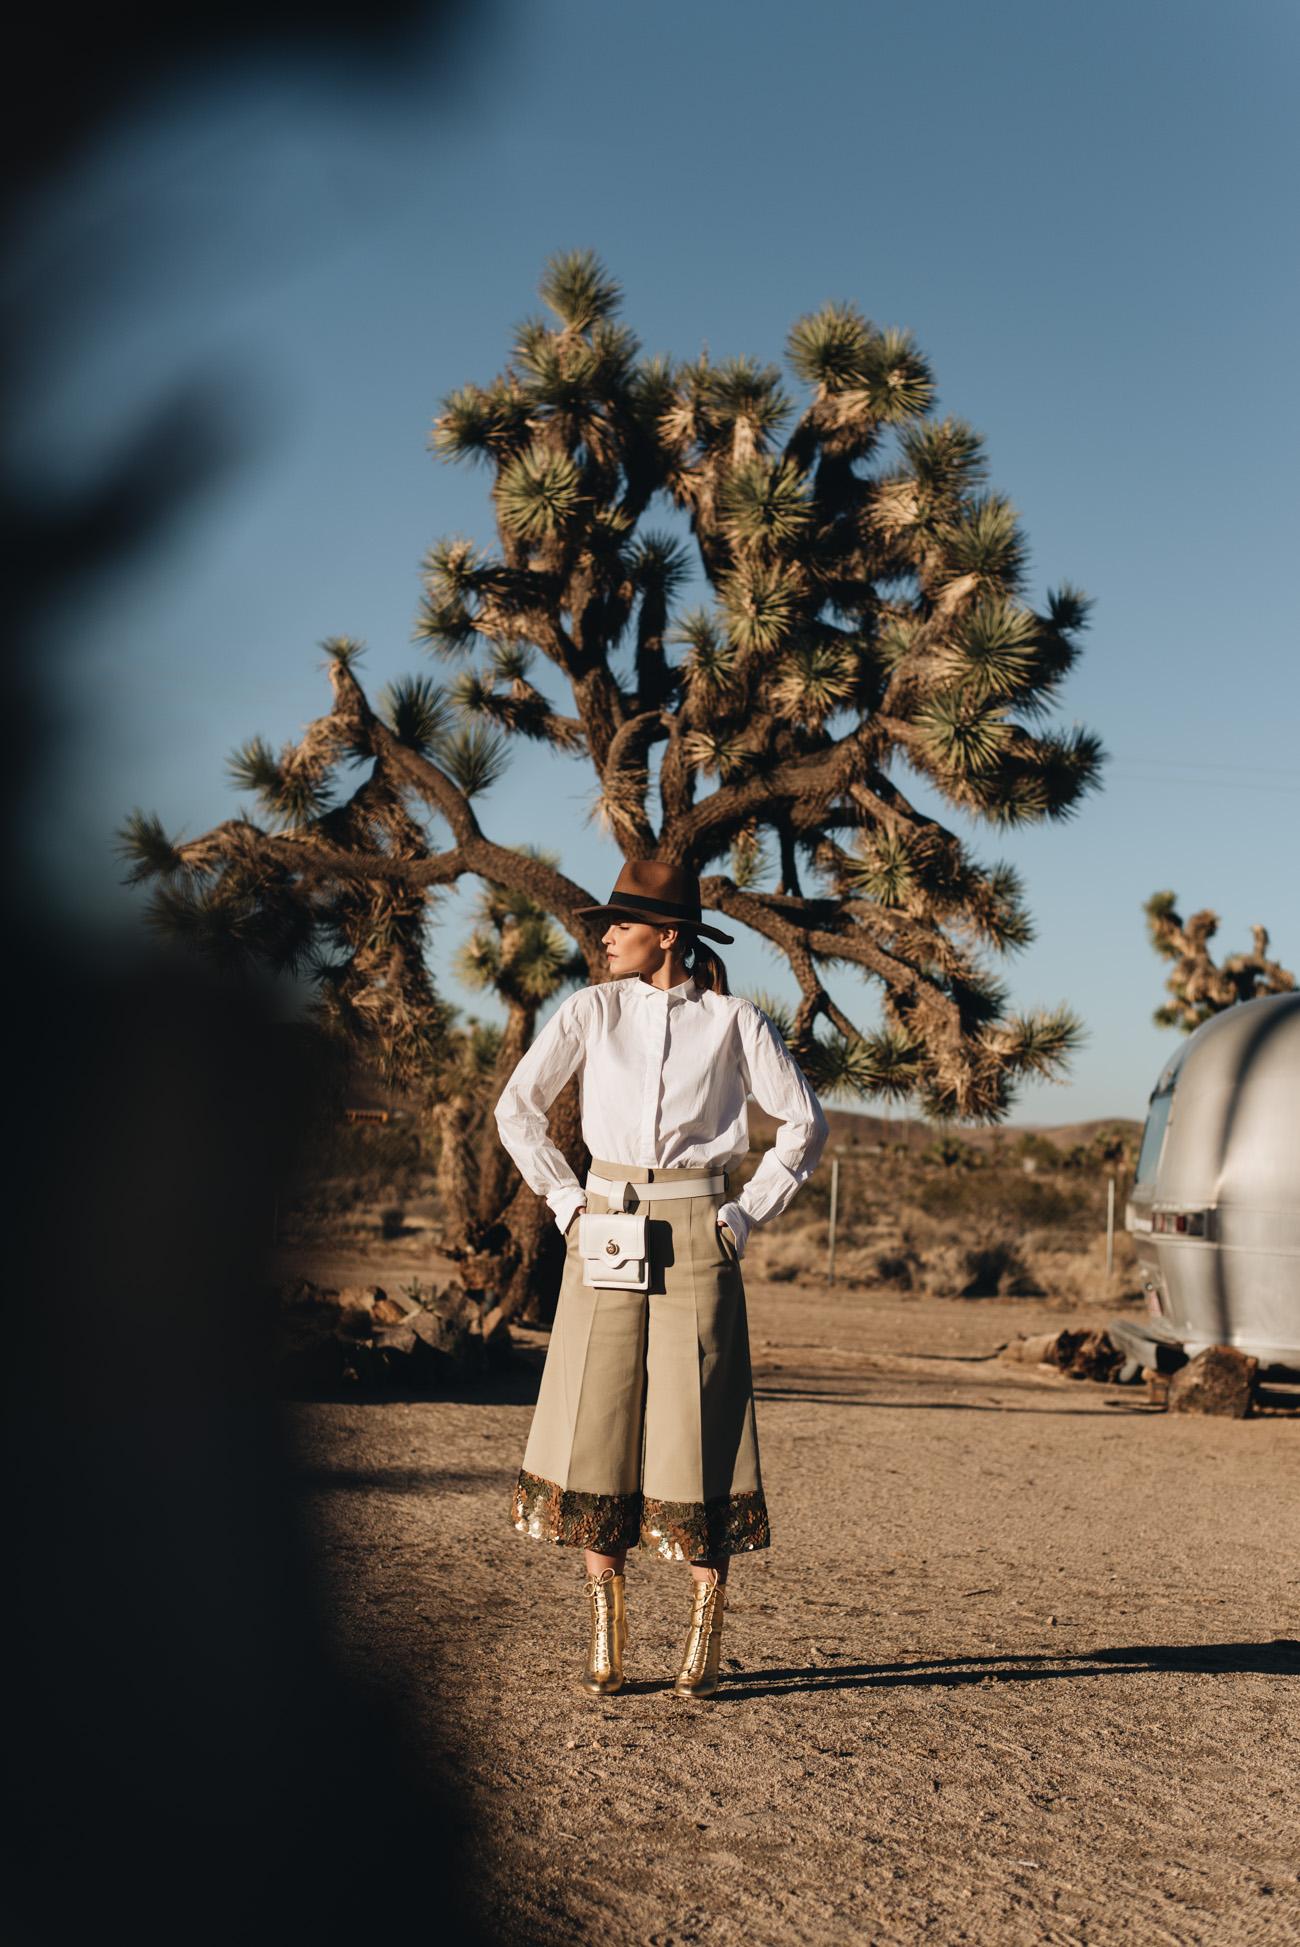 Joshua-Tree-acres-airstream-wohnwagen-Jimmy-Choo-Daize-100-boots-stiefeletten-goldene-Schuhe-Culotte-Pailletten-nina-schwichtenberg-fashiioncarpet